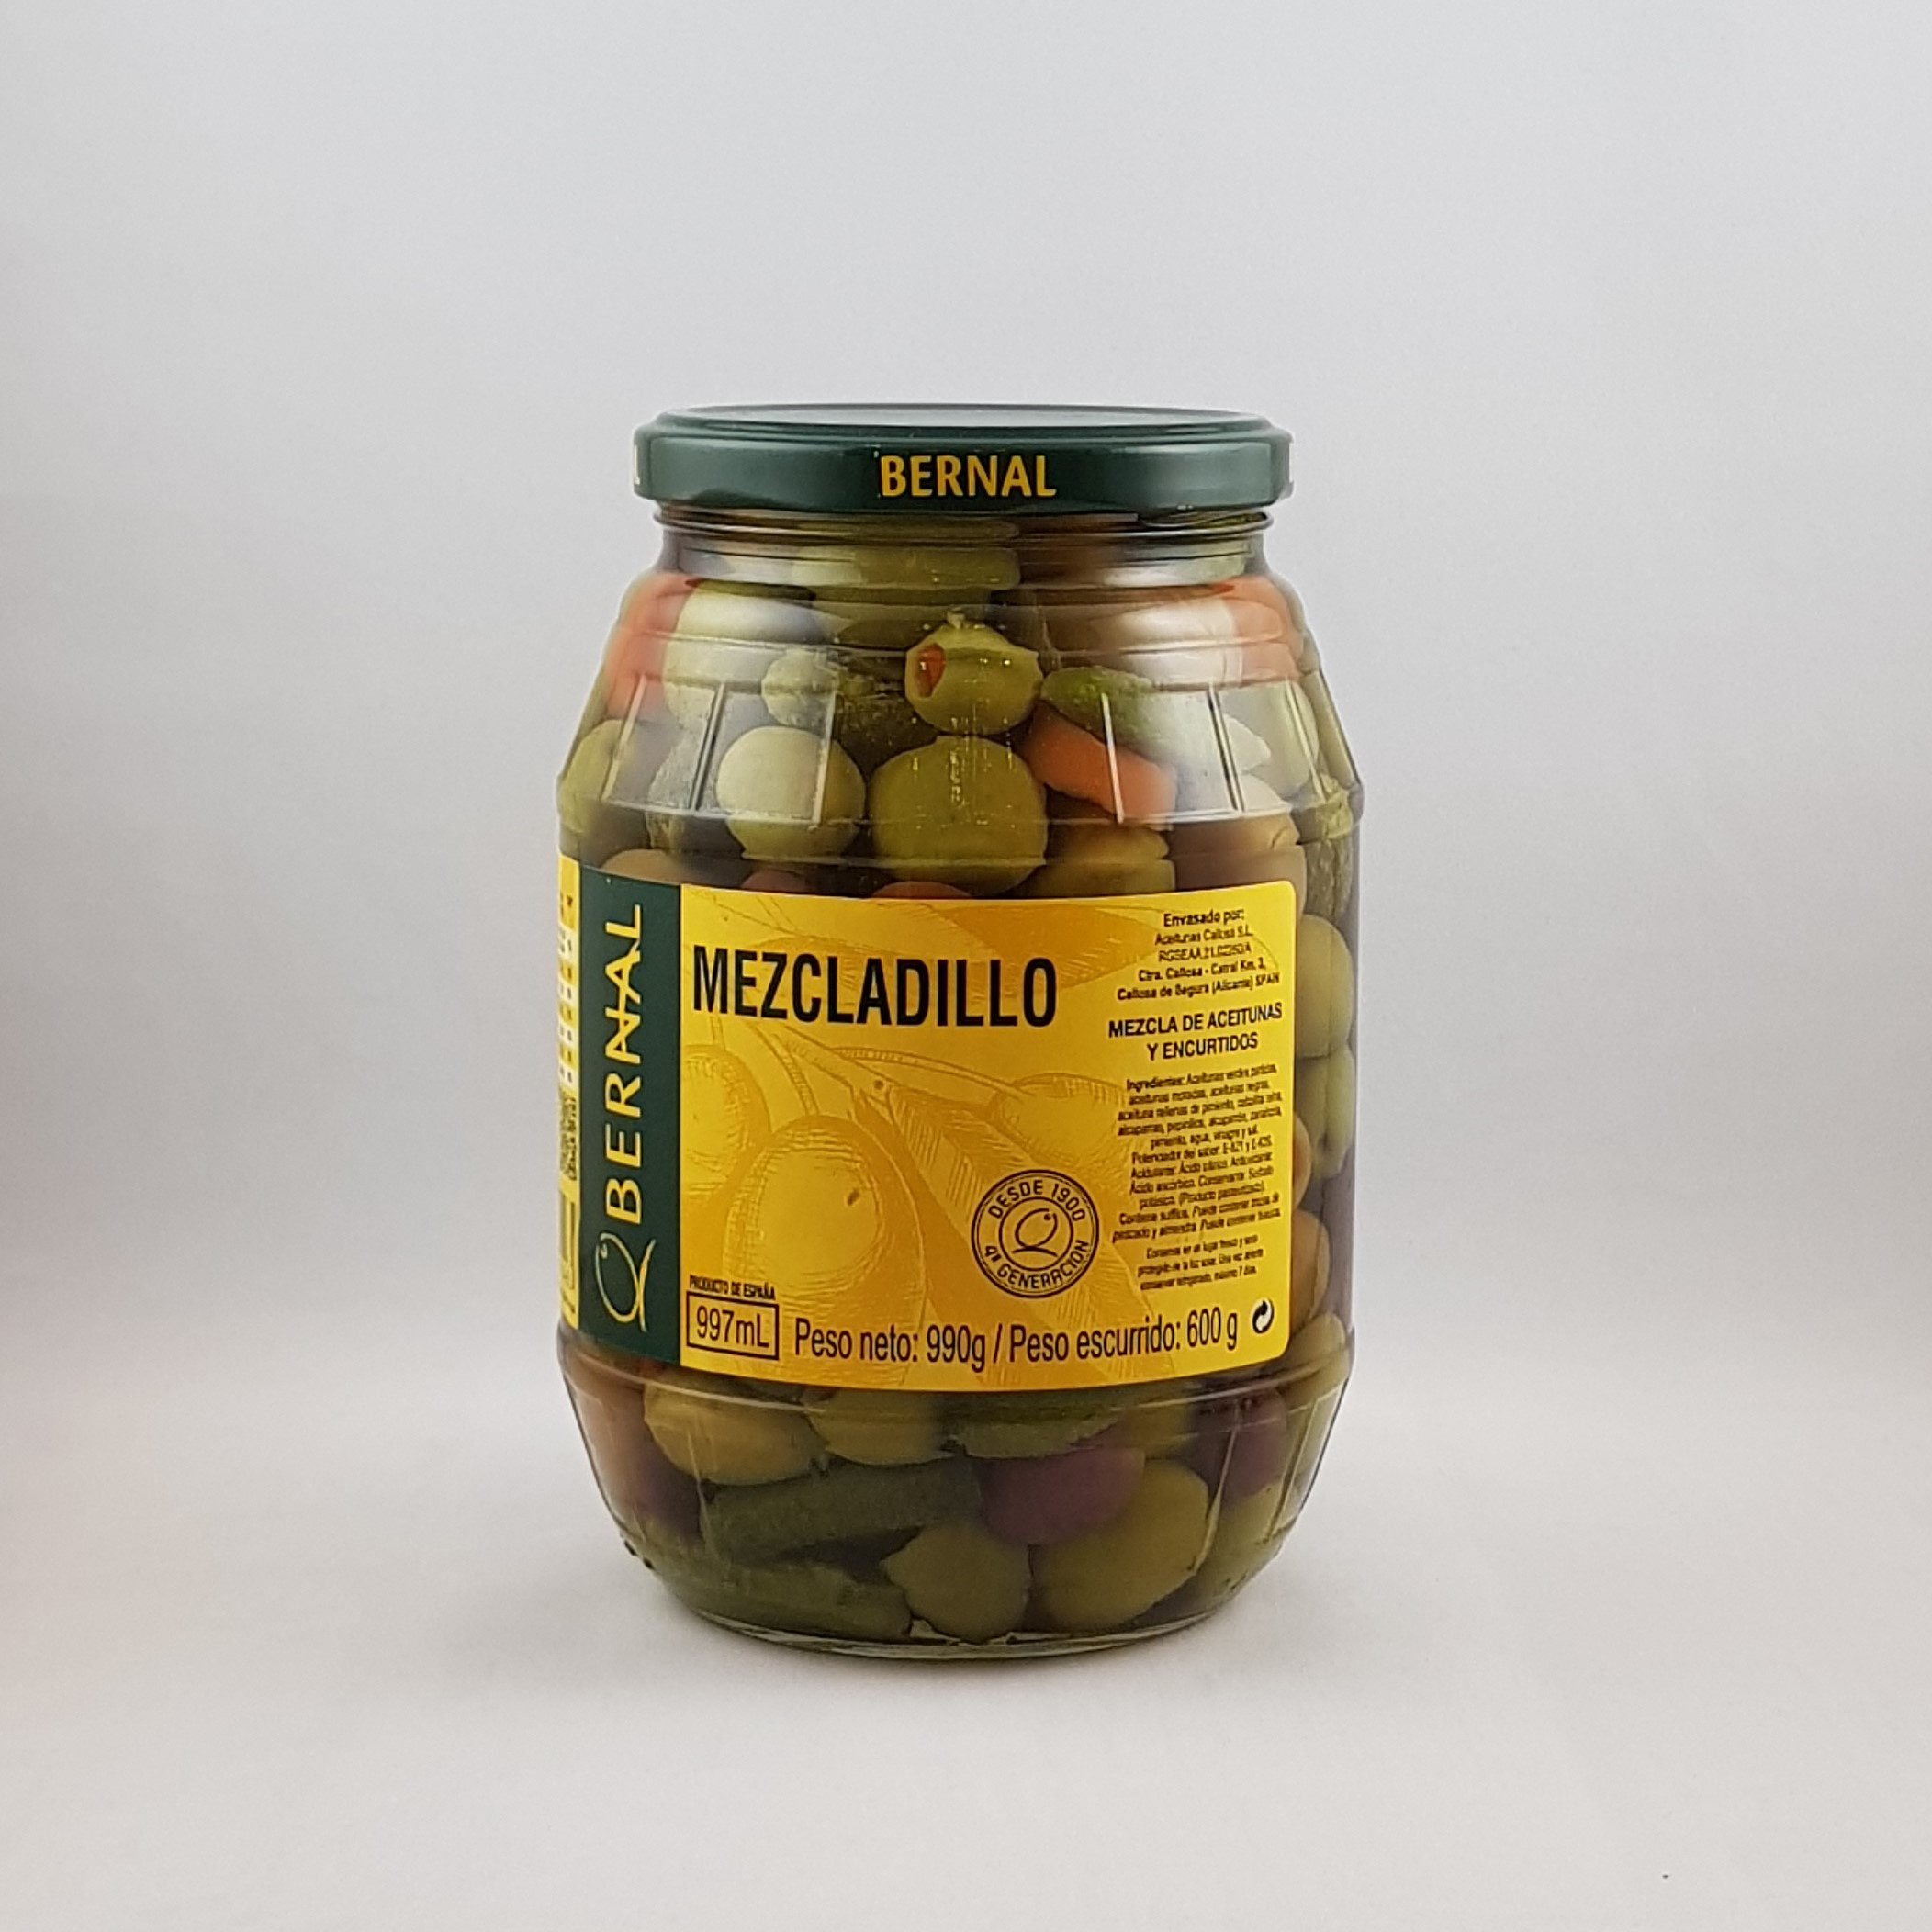 Bernal Mezcladillo Mixed Olives